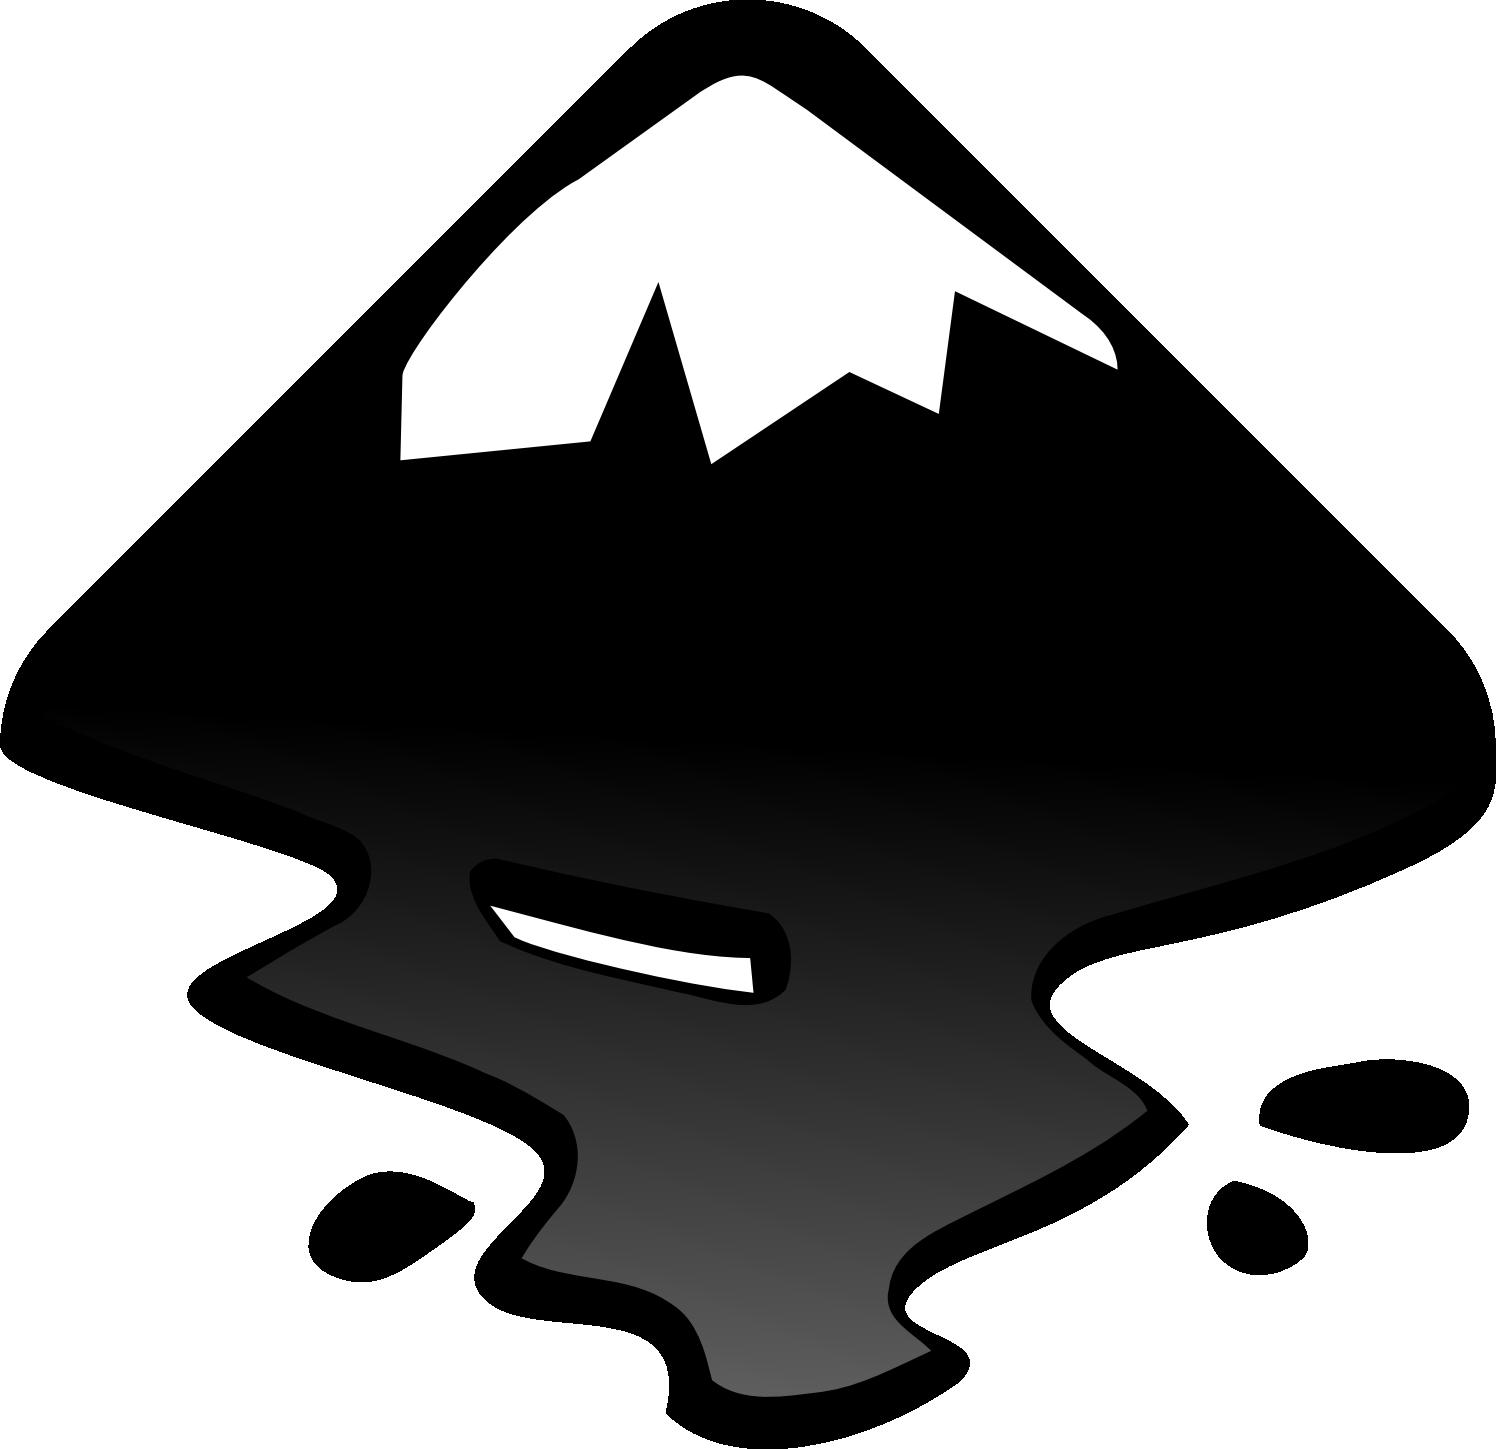 inkscape-logo-40.png?nocache=1309003849279